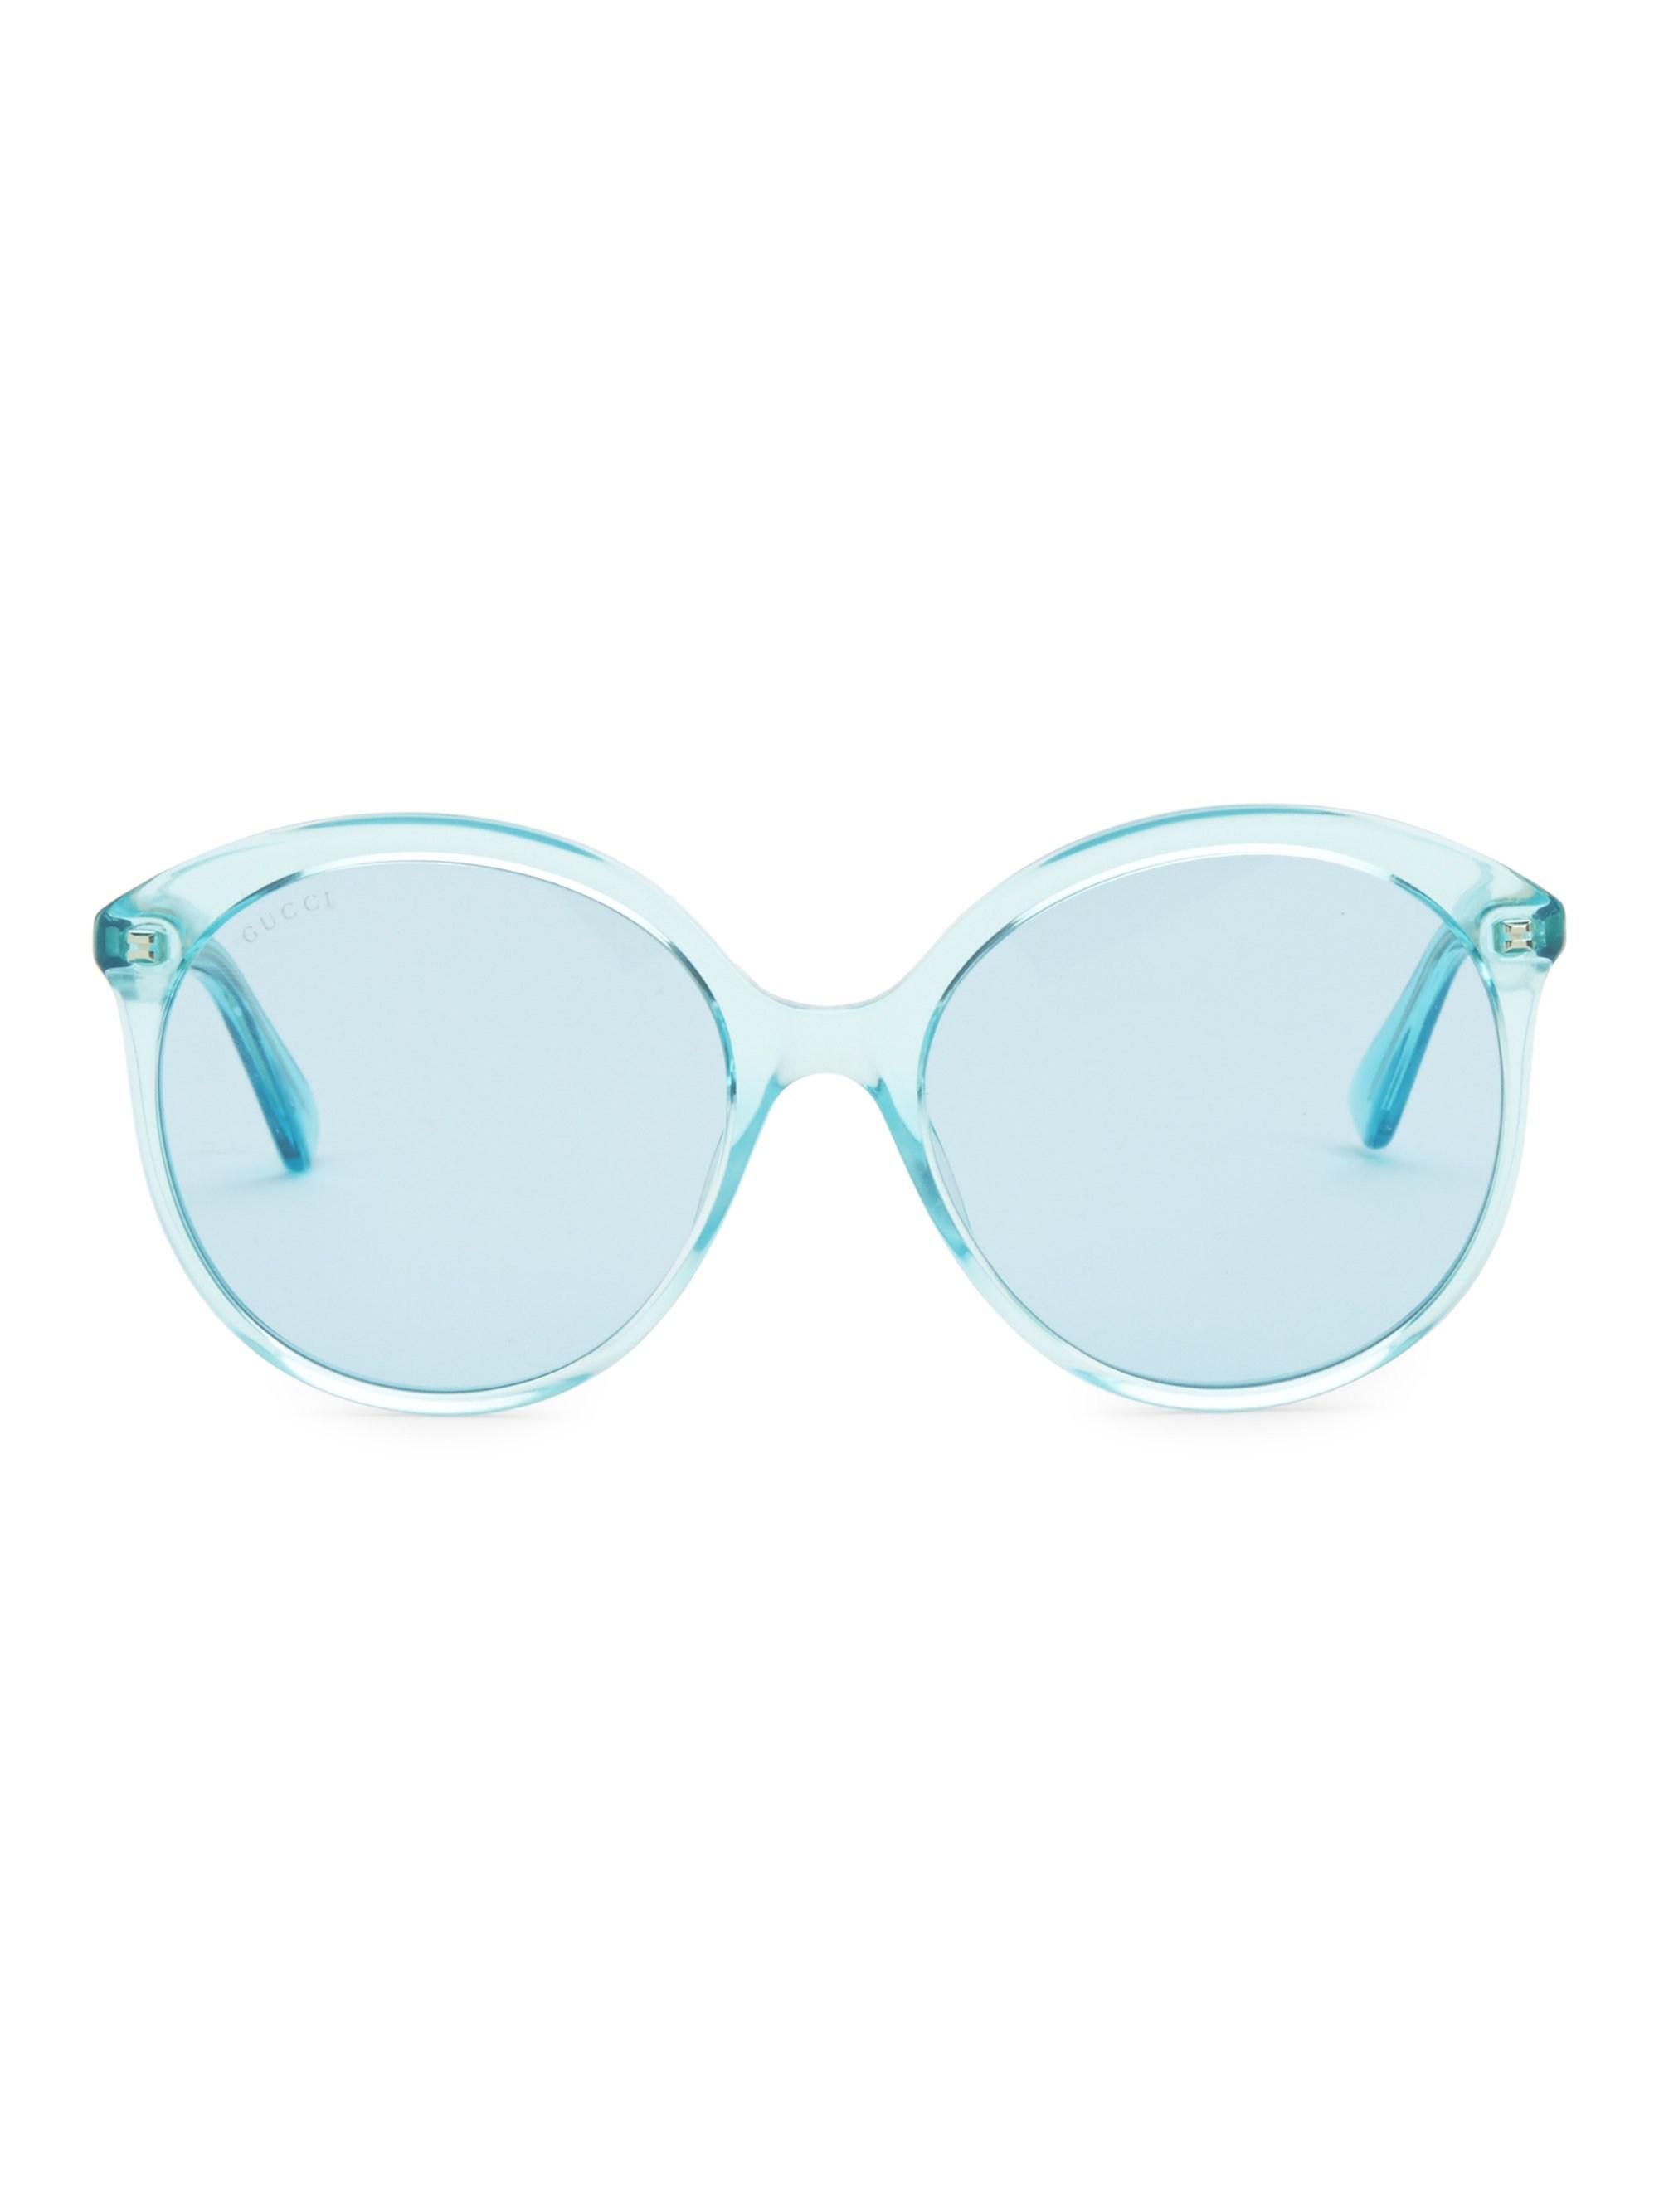 9365c4be9b9 Lyst - Gucci Women s 59mm Round Sunglasses - Azure in Blue